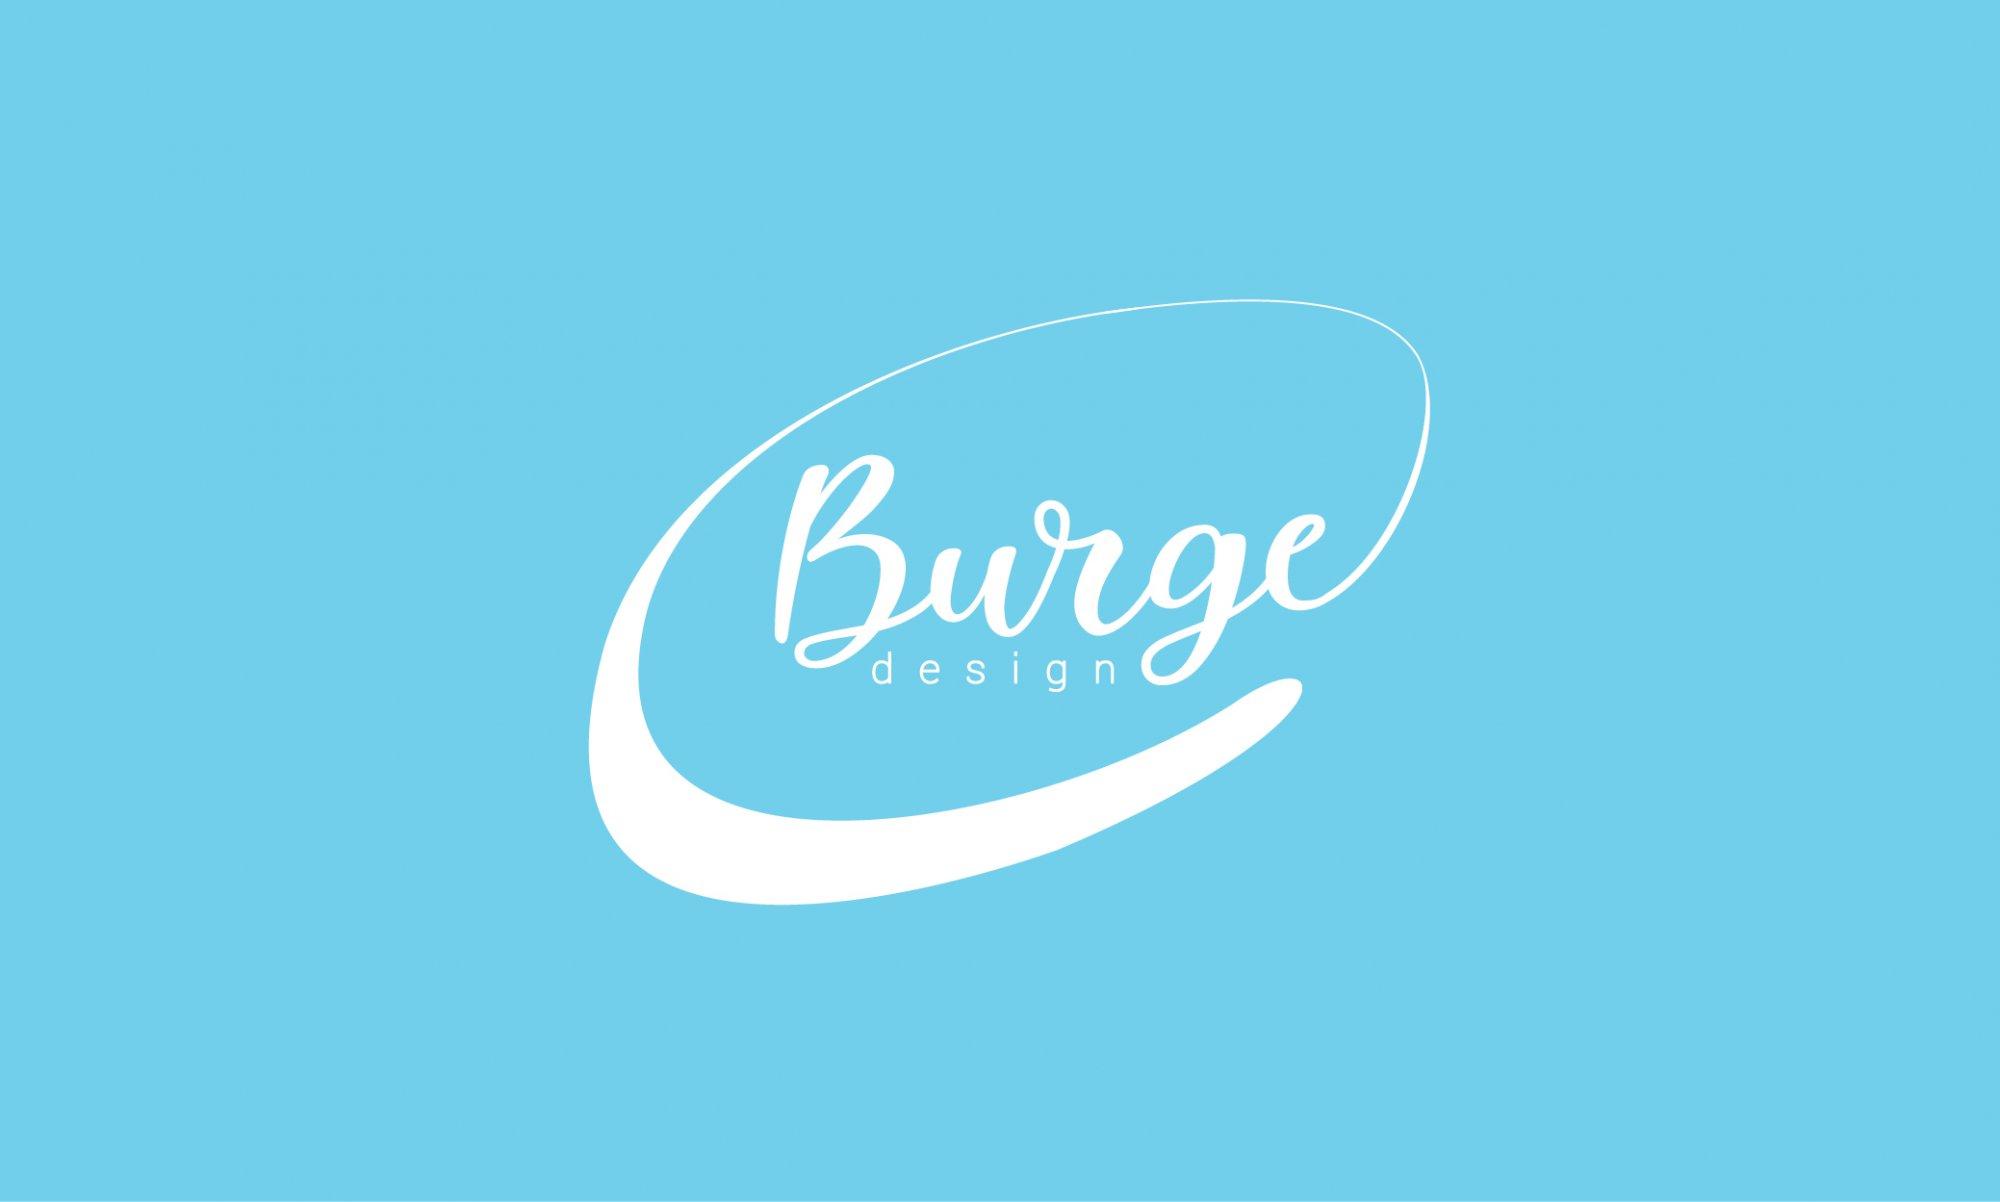 Brett Burge Design | Brands of the World™ | Download vector logos ...